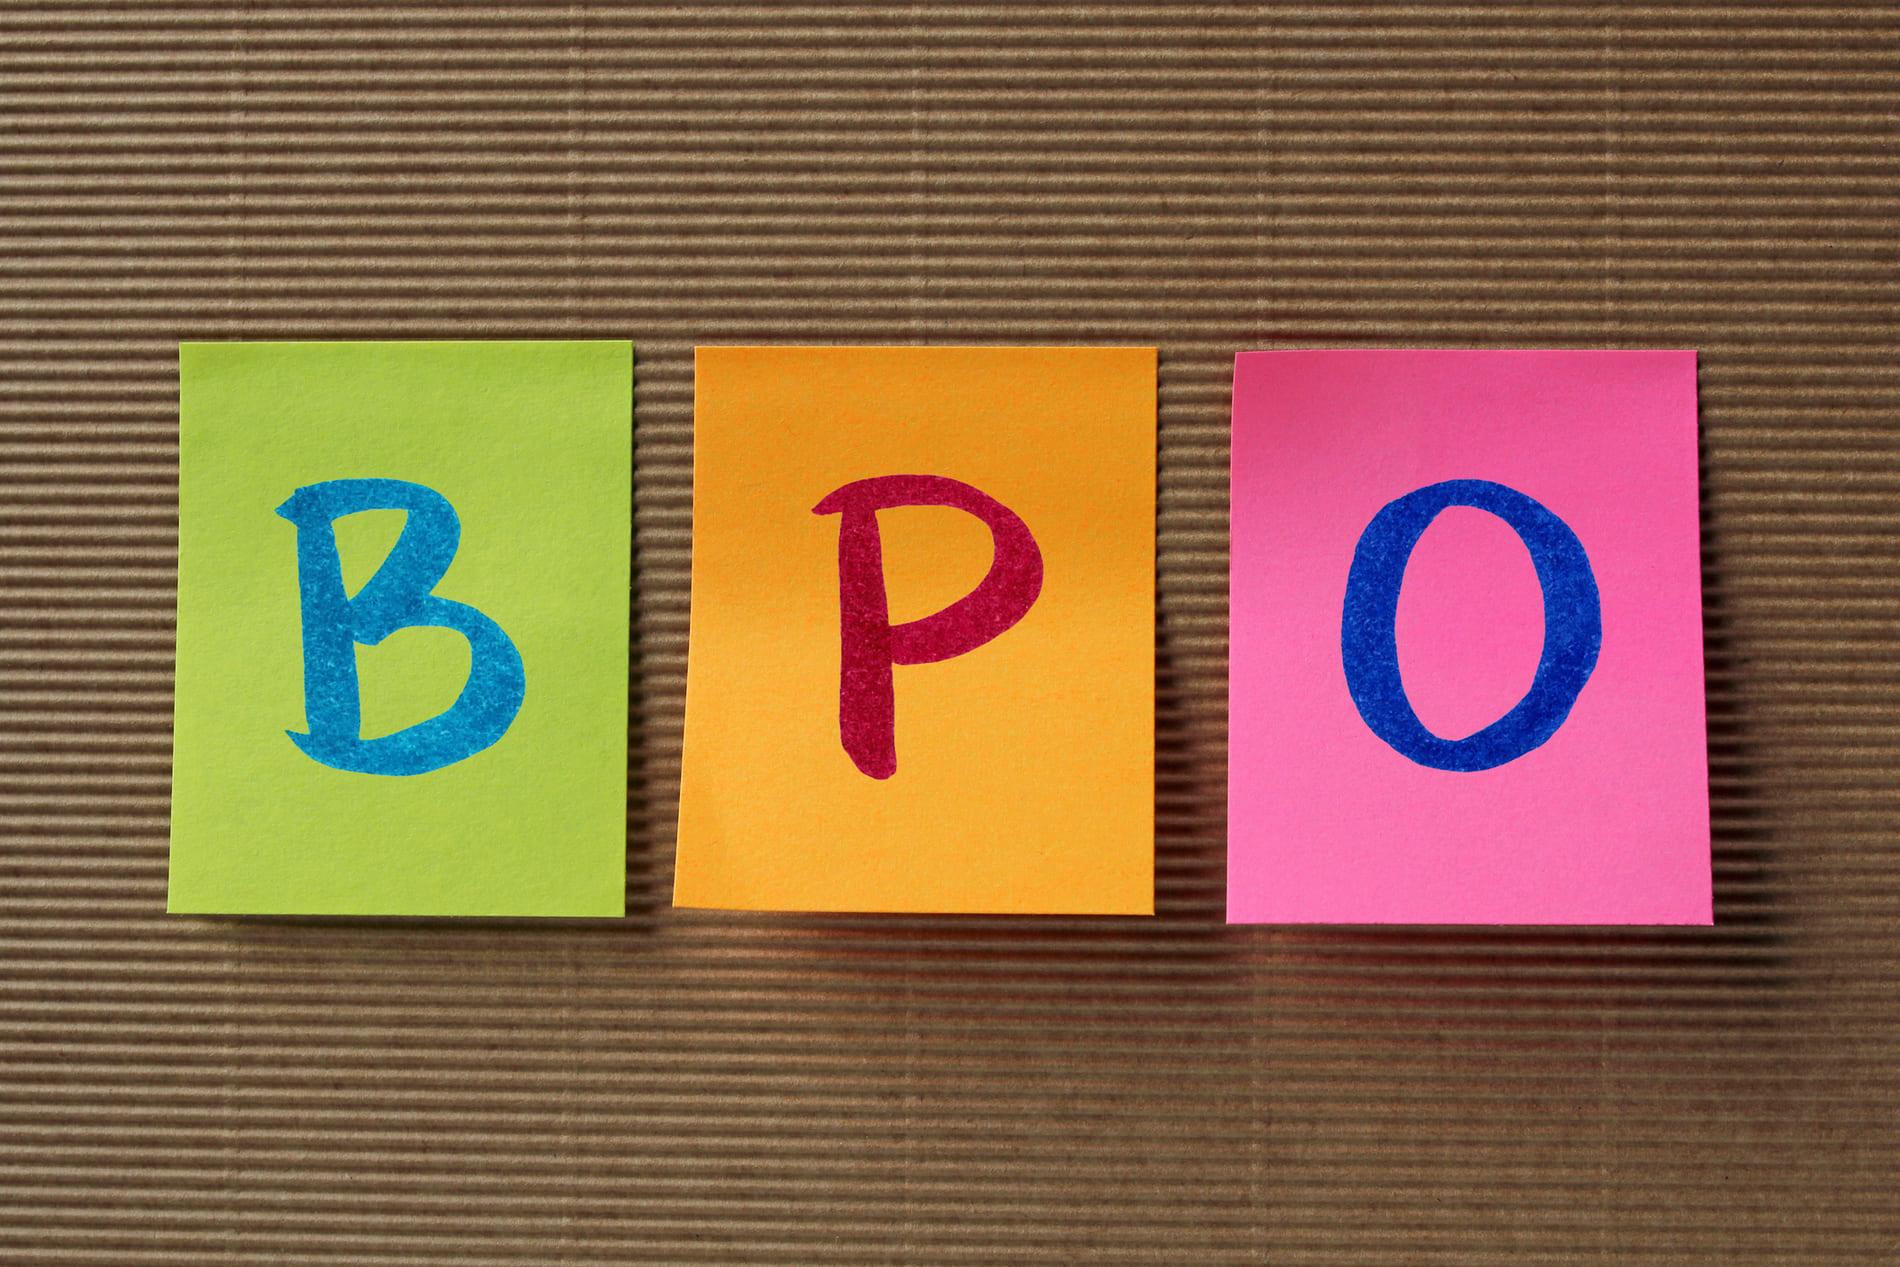 7 problemas que o BPO pode ajudar a resolver